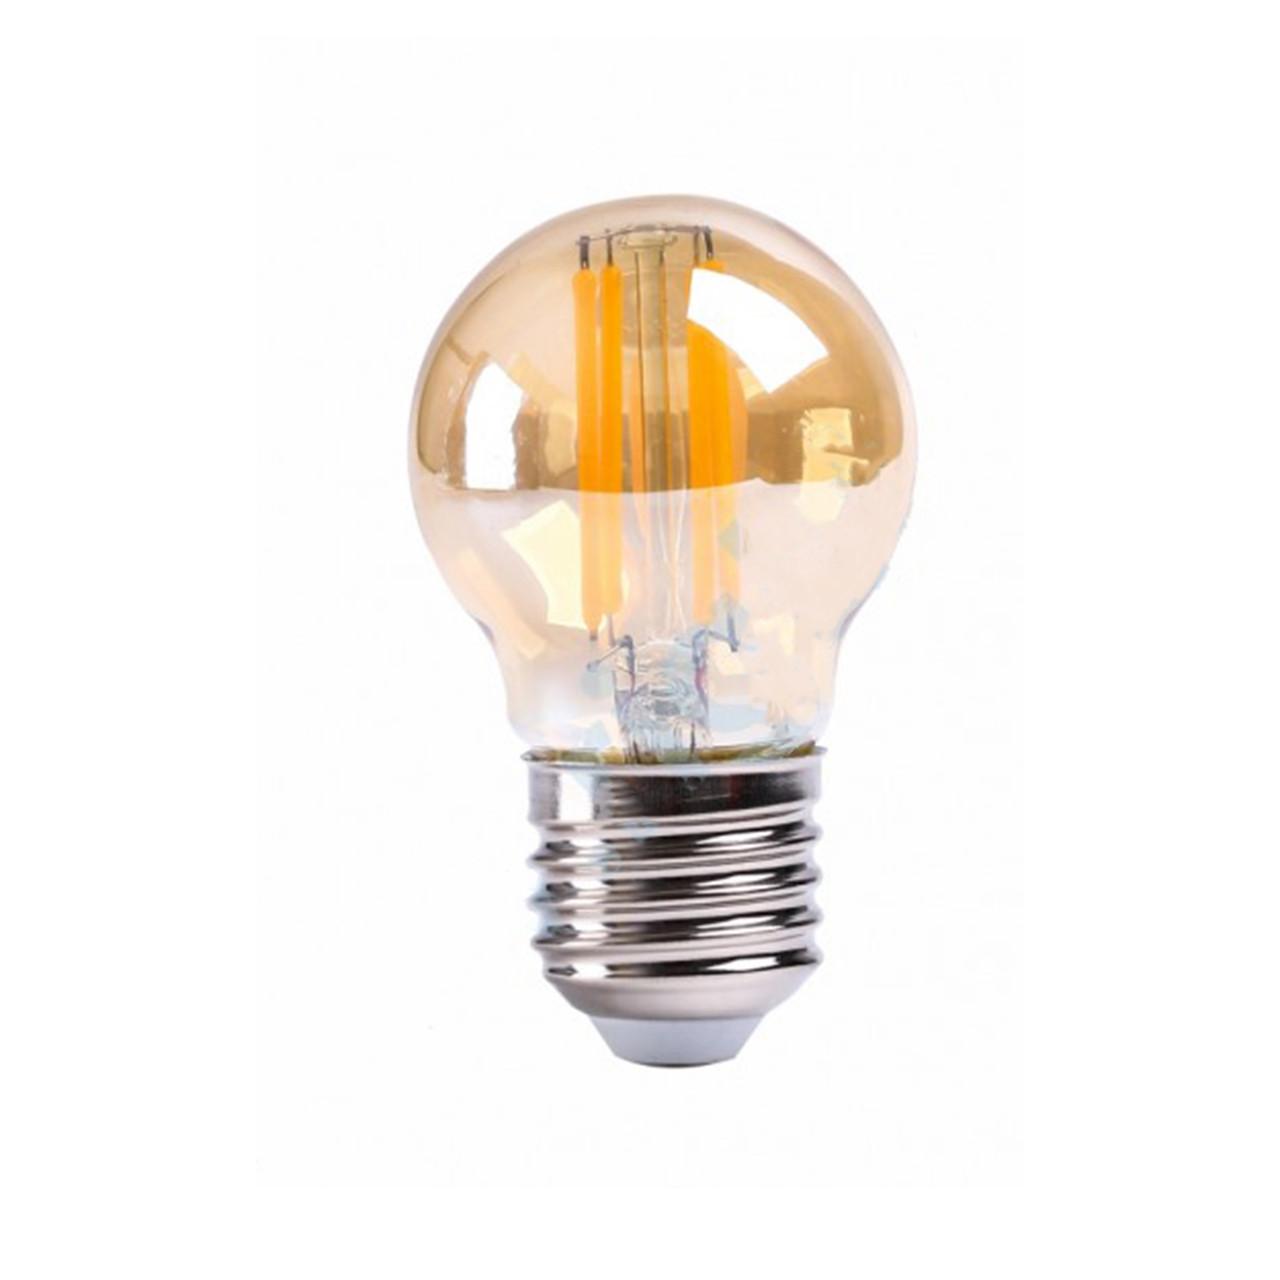 Лампа  LED Platinum Filament Шар 6W E27 4000K золотая G45 RIGHT HAUSEN